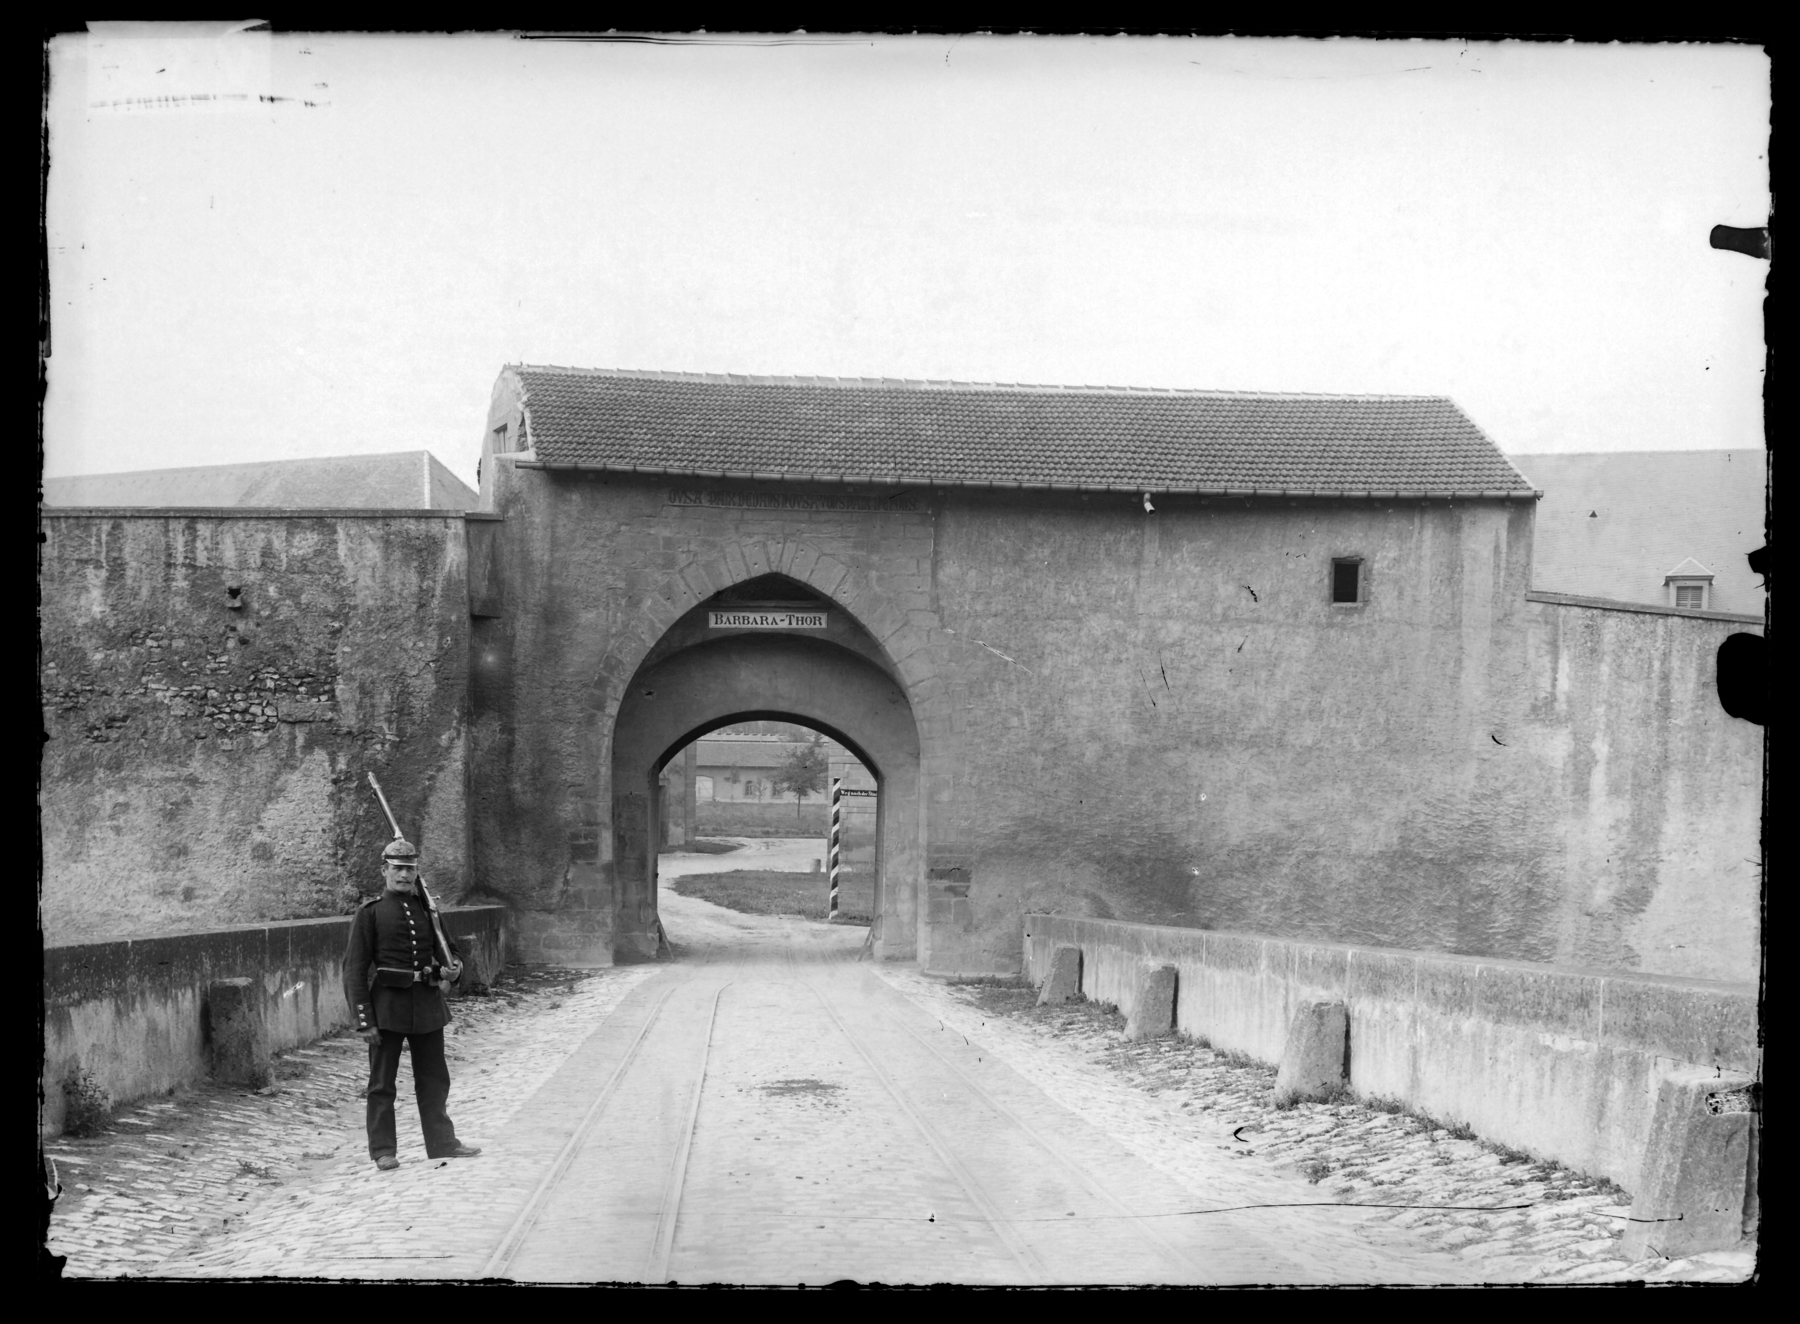 Contenu du La porte Sainte-Barbe